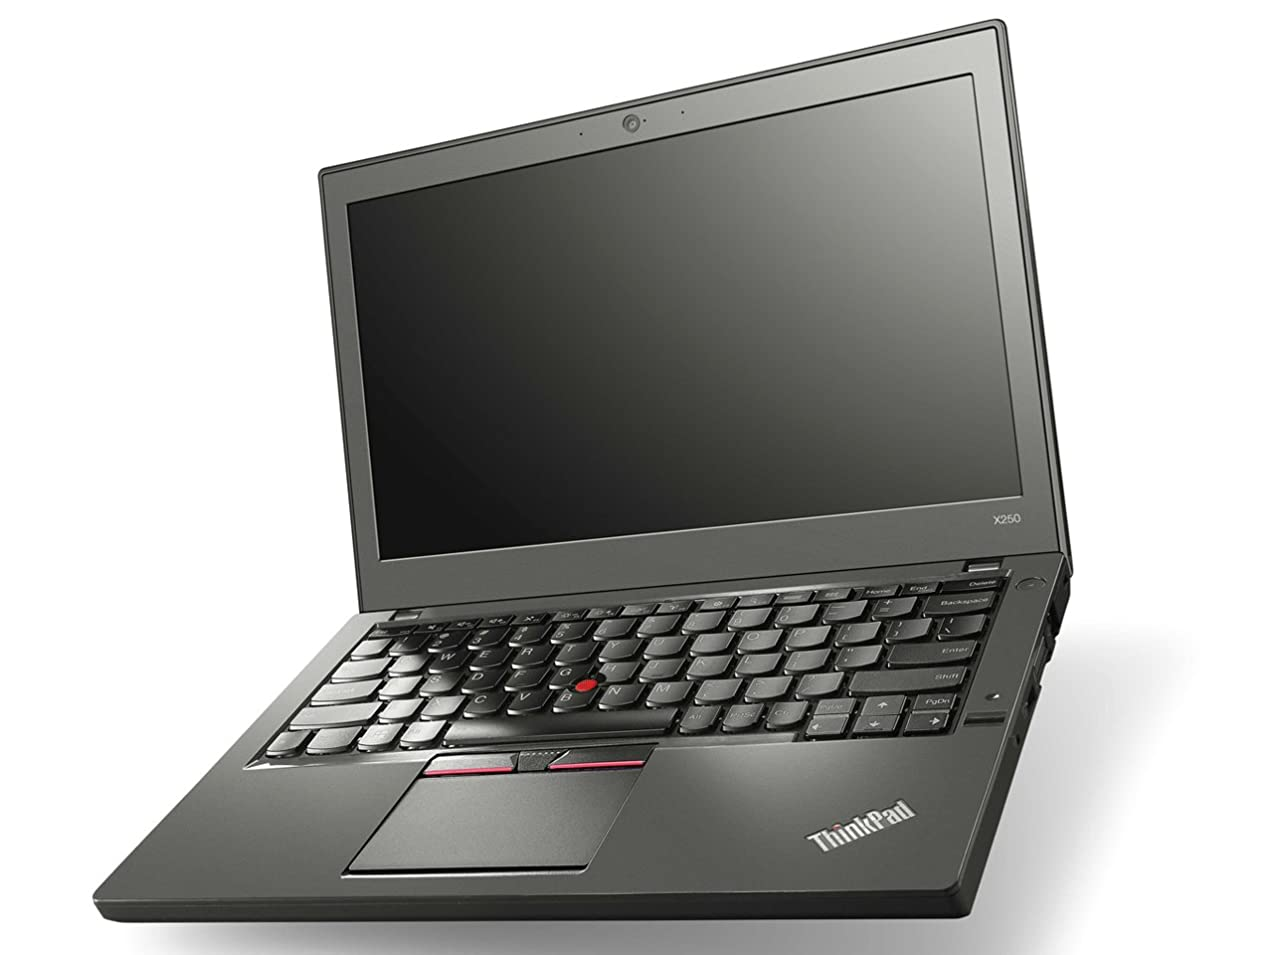 2018 Lenovo ThinkPad X250 Touch Performance Touchscreen Laptop, Intel Core i5-5300U 2.3GHz, 8GB Ram, 240GB SSD, WiFi, Bluetooth, USB 3.0, Windows 10 Professional (Renewed)